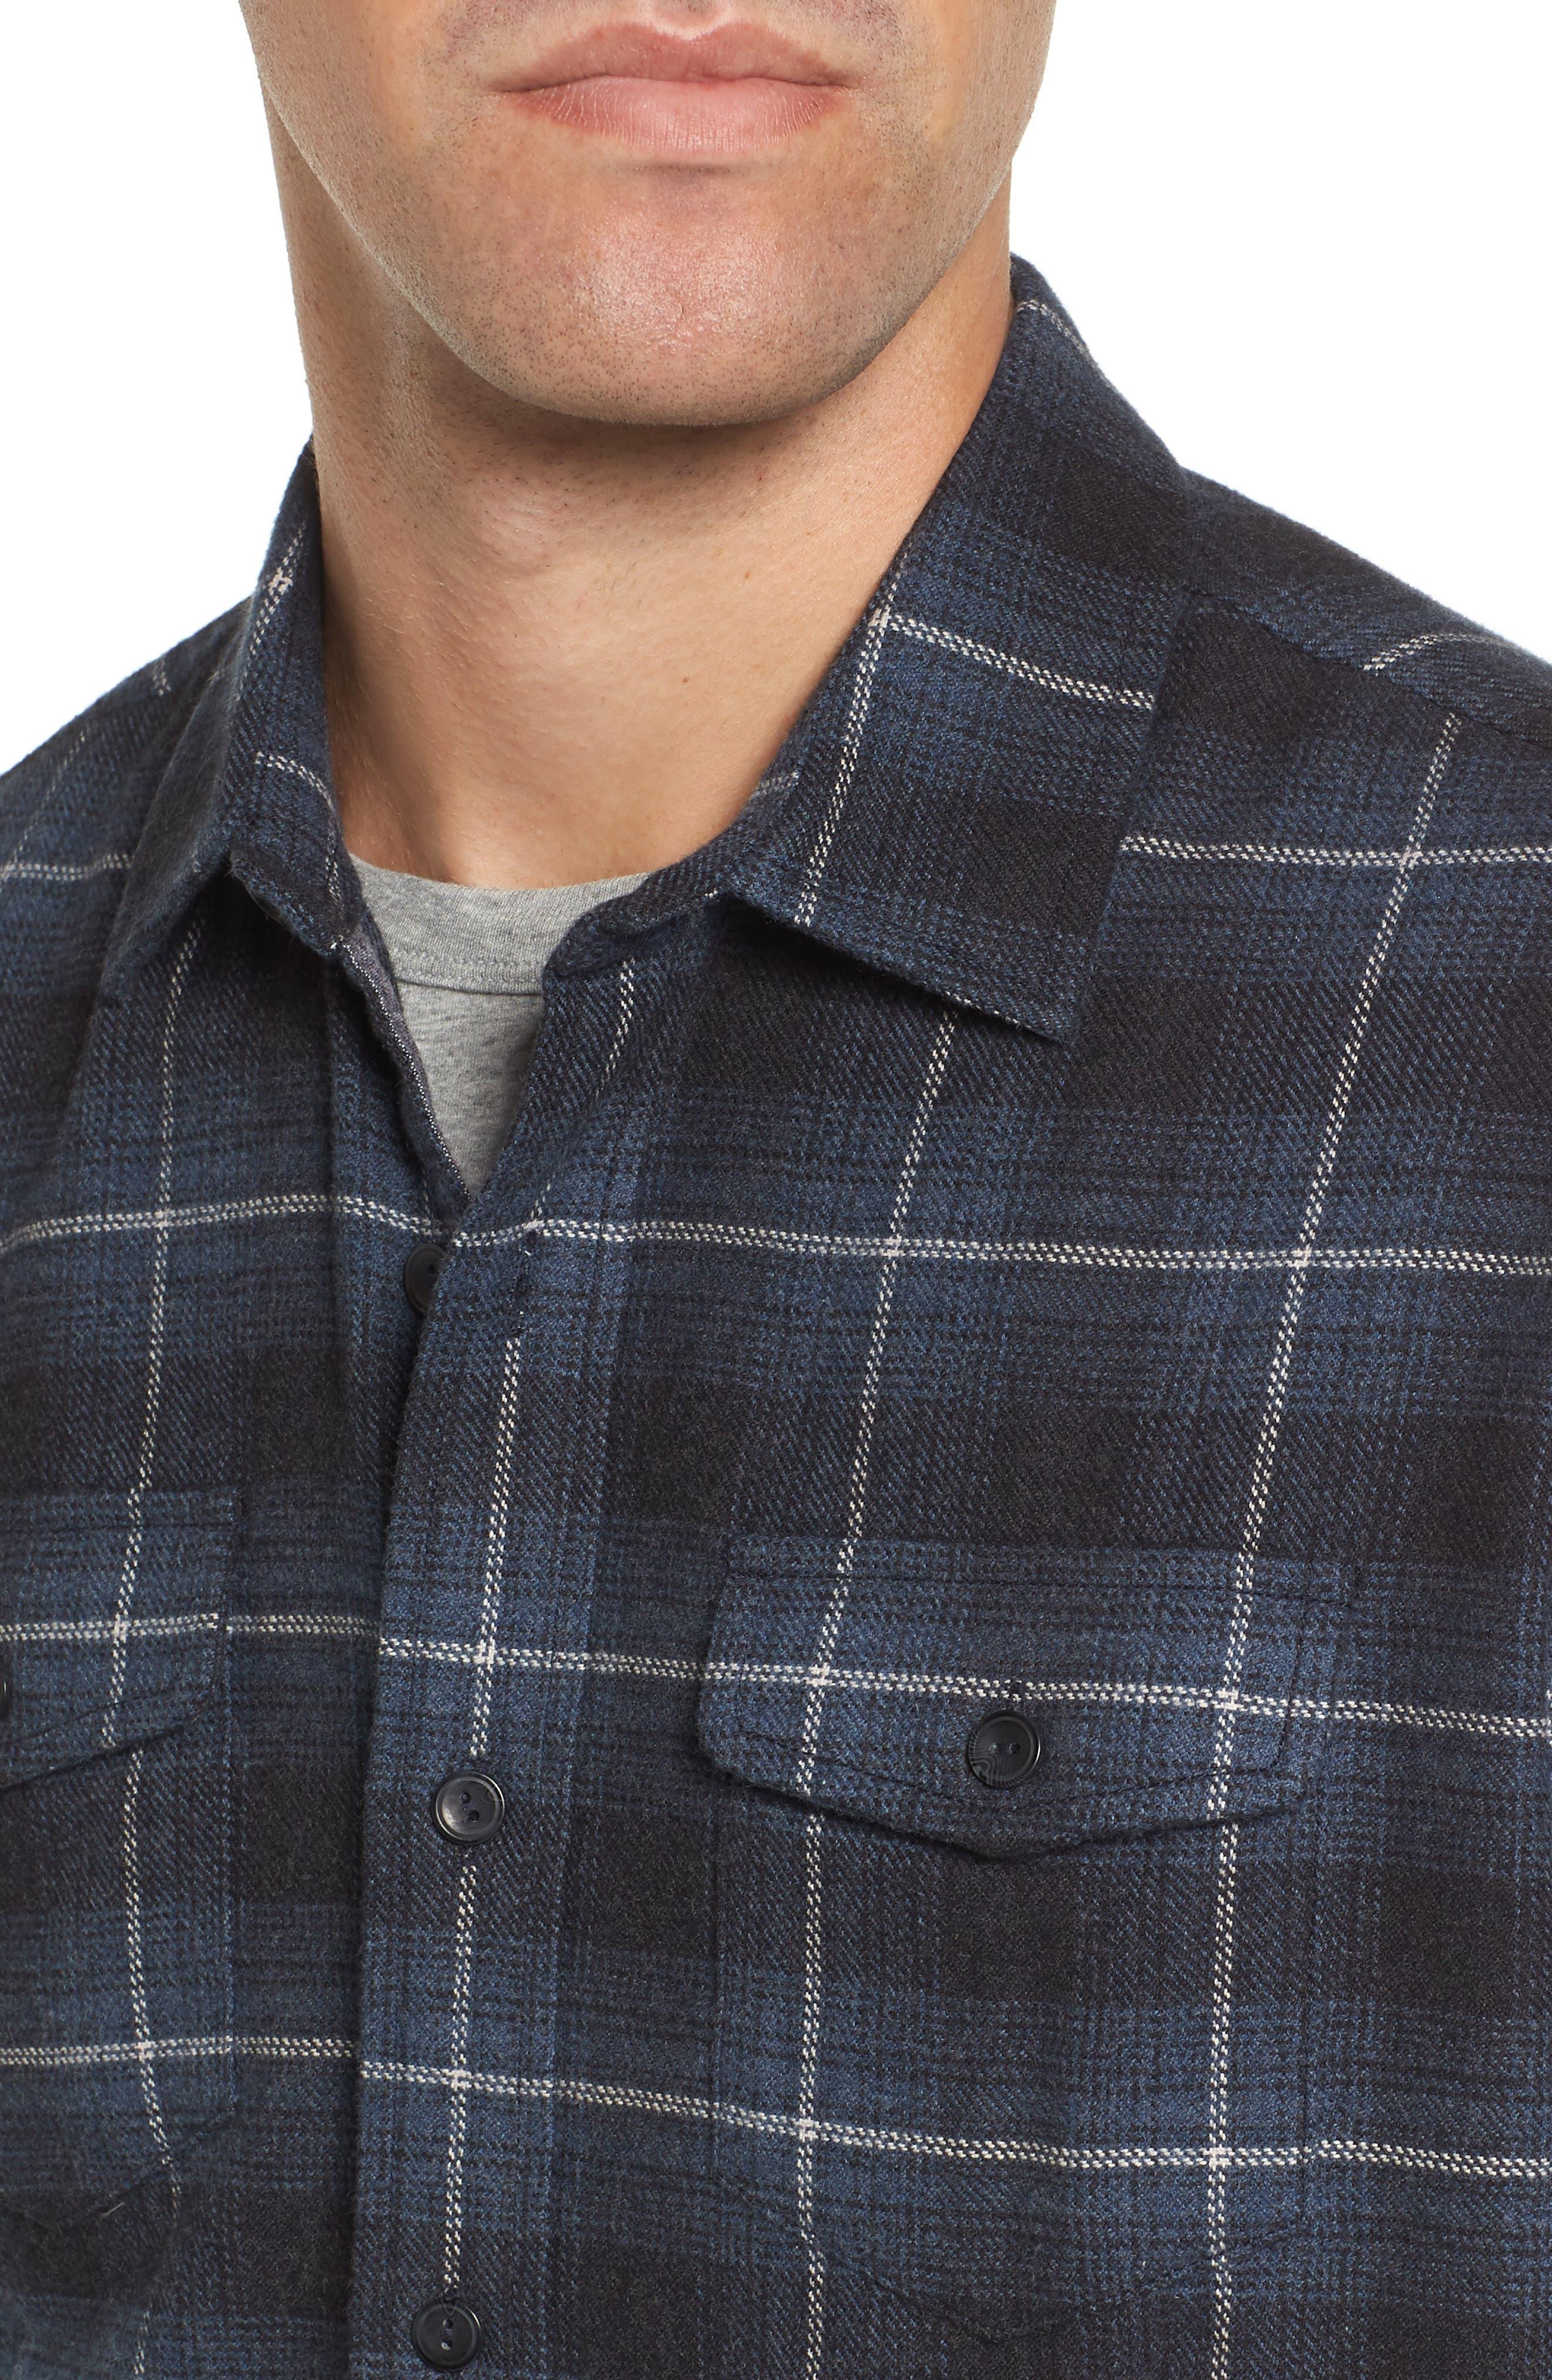 Clarke Heritage Flannel Shirt,                             Alternate thumbnail 4, color,                             Blue Charcoal